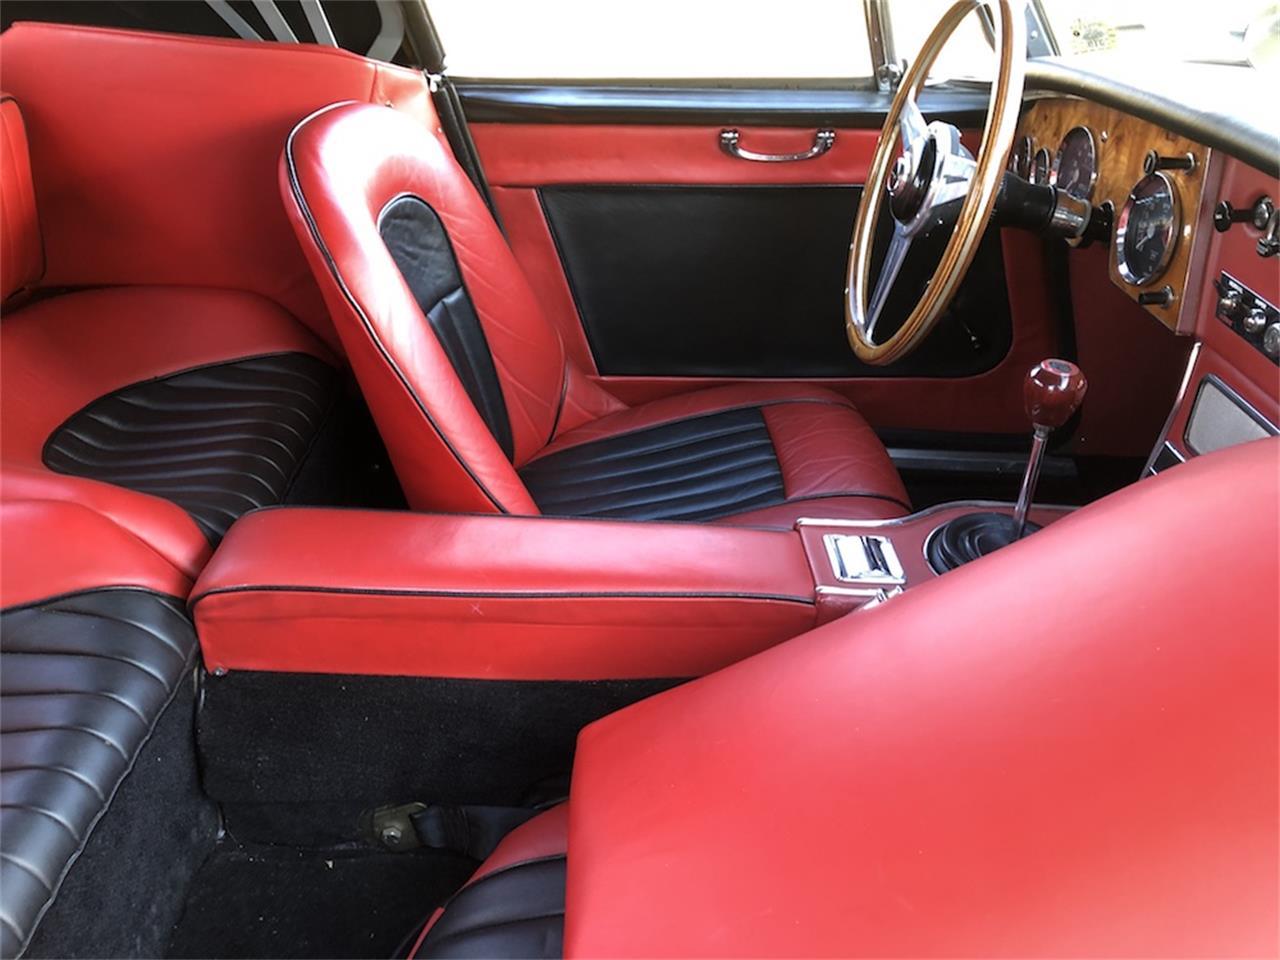 1967 Austin-Healey 3000 Mark III BJ8 (CC-1314743) for sale in Southampton, New York